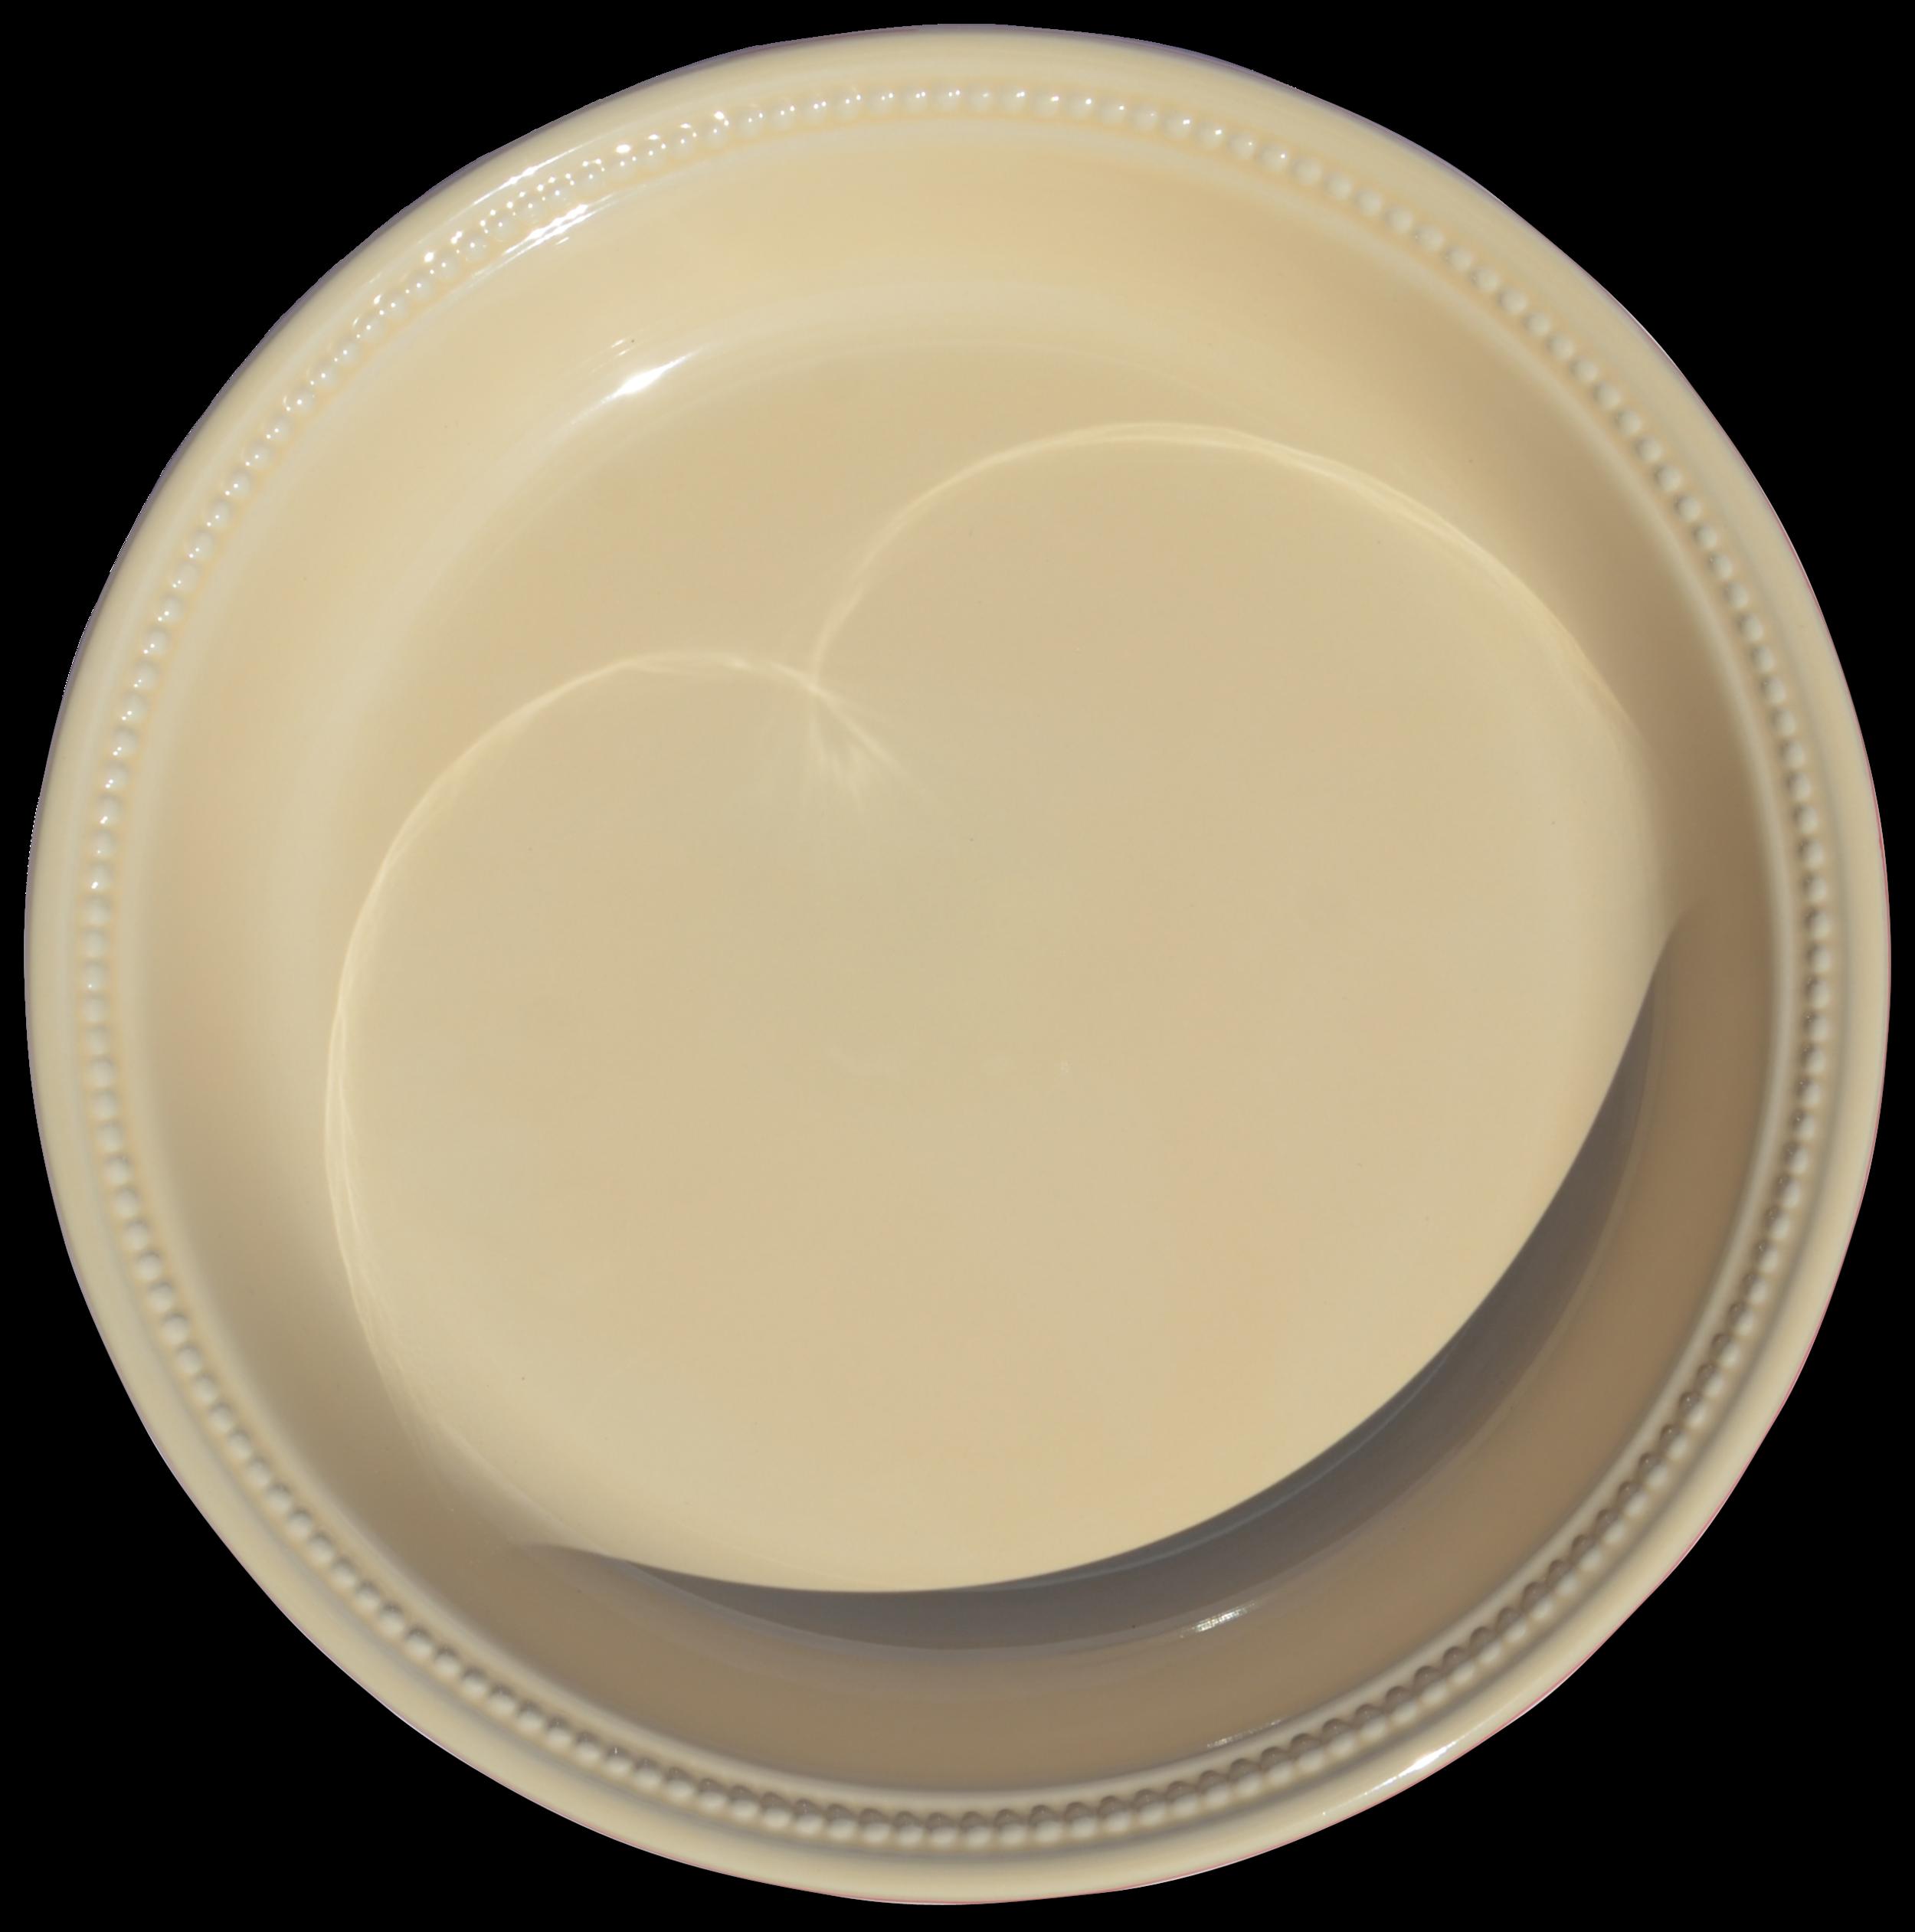 "Le Creuset Stoneware Pie Dish 10"" Cherry"